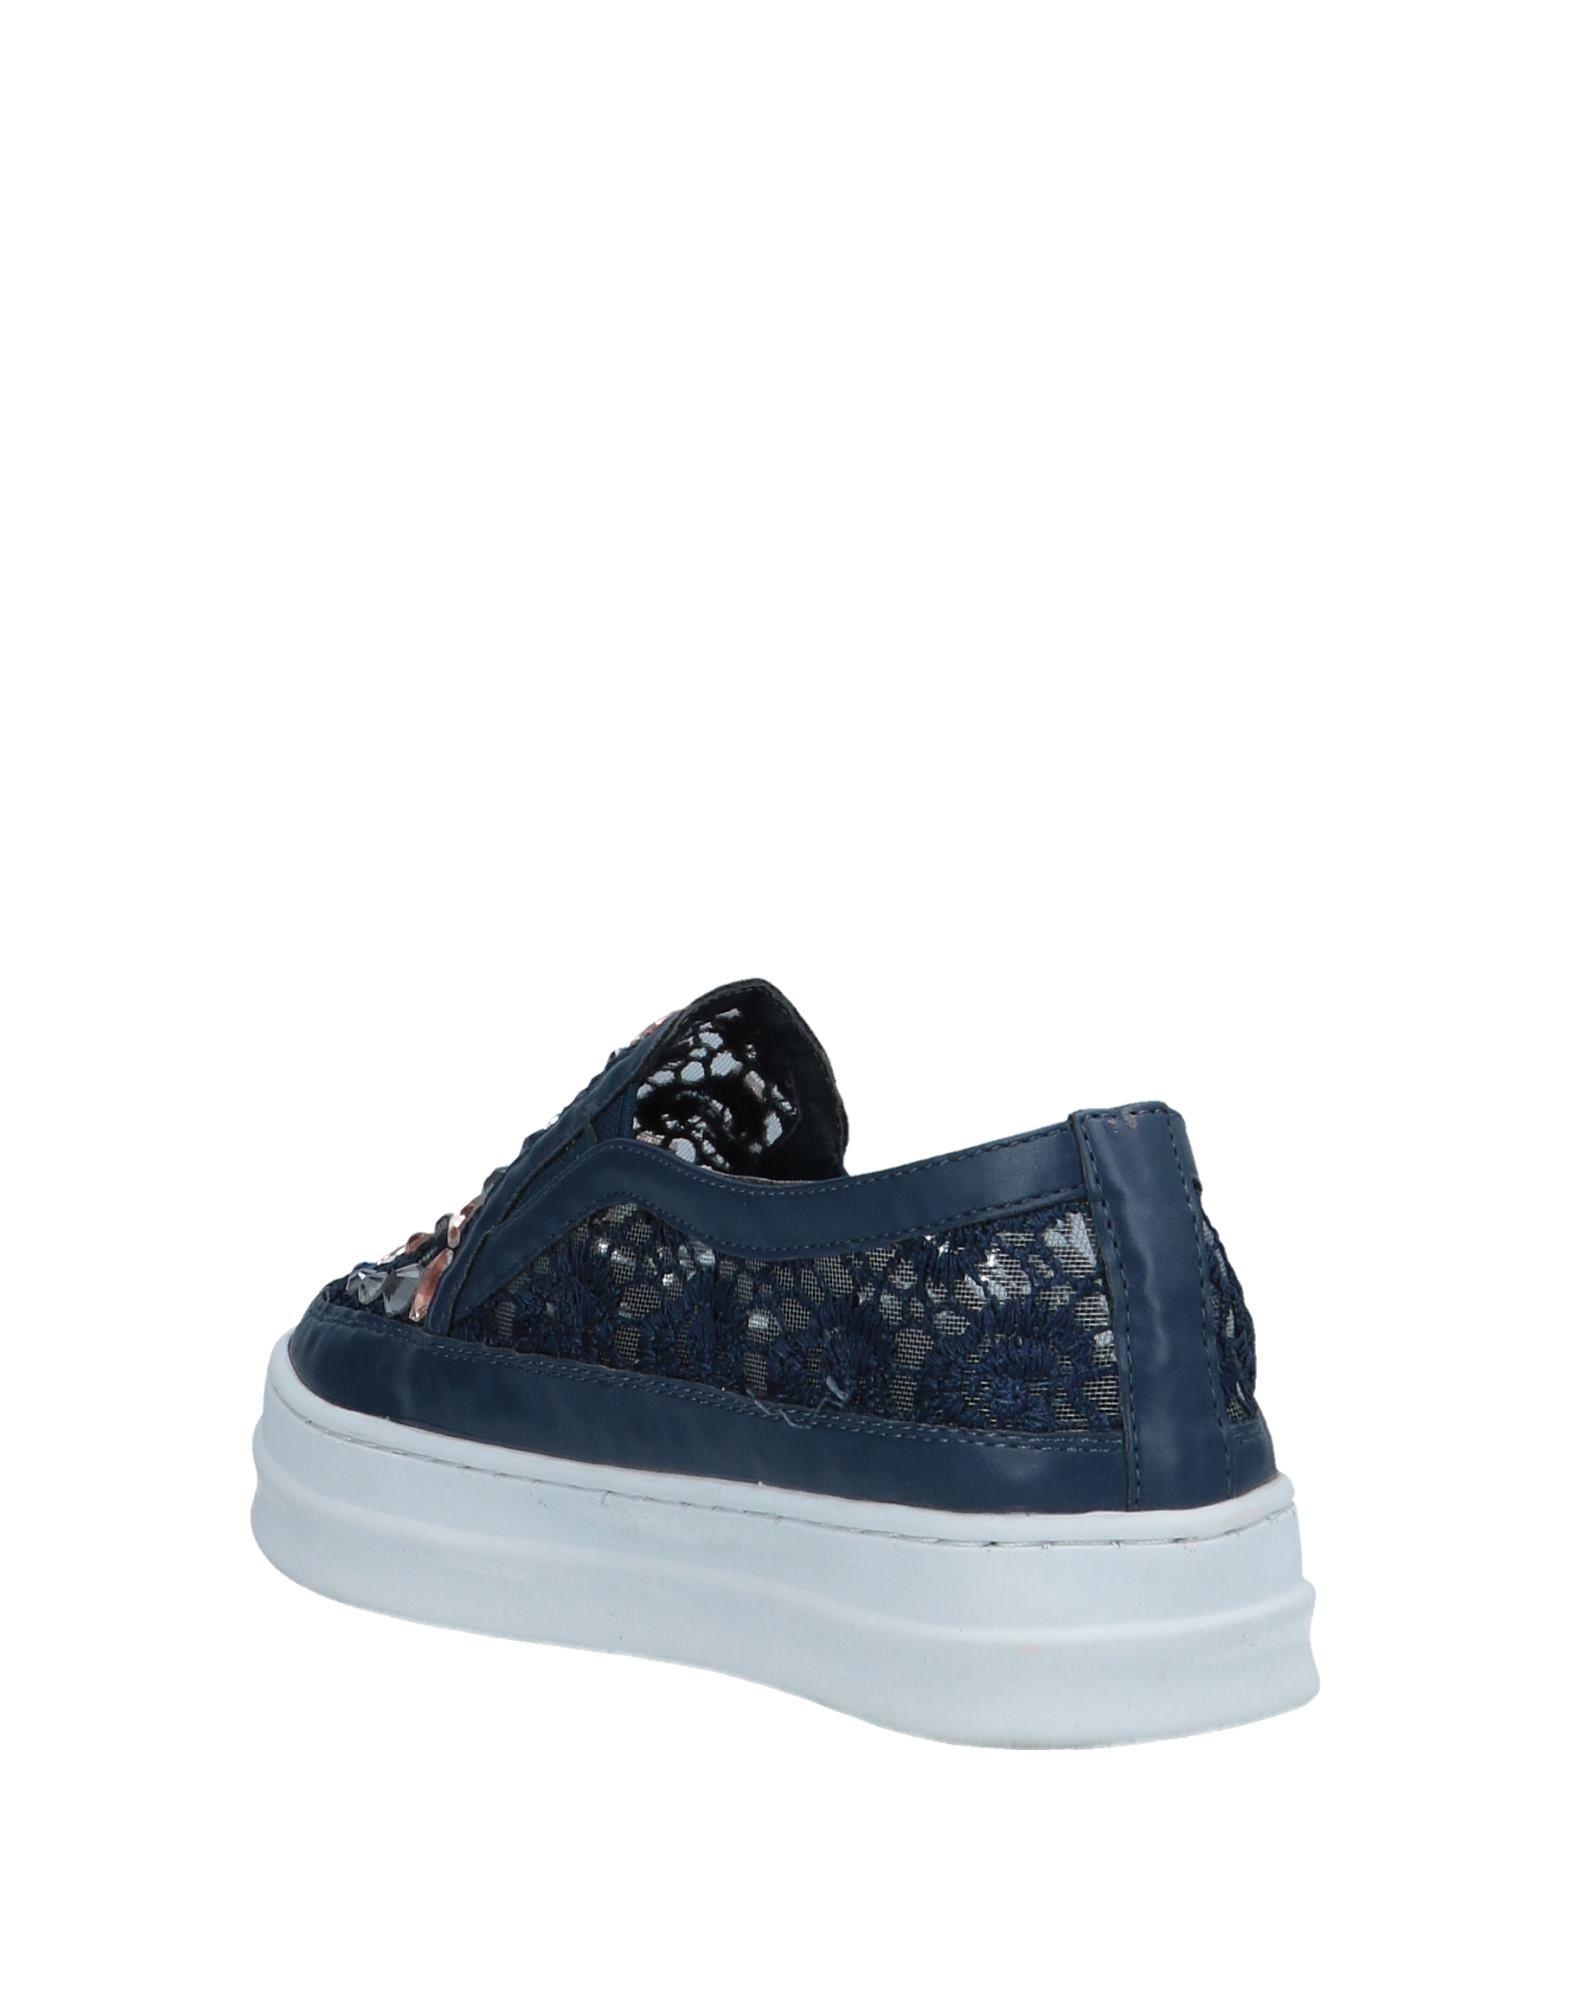 Laura Biagiotti Sneakers - Women Laura Biagiotti Sneakers online on on on  United Kingdom - 11565658WU e304d9